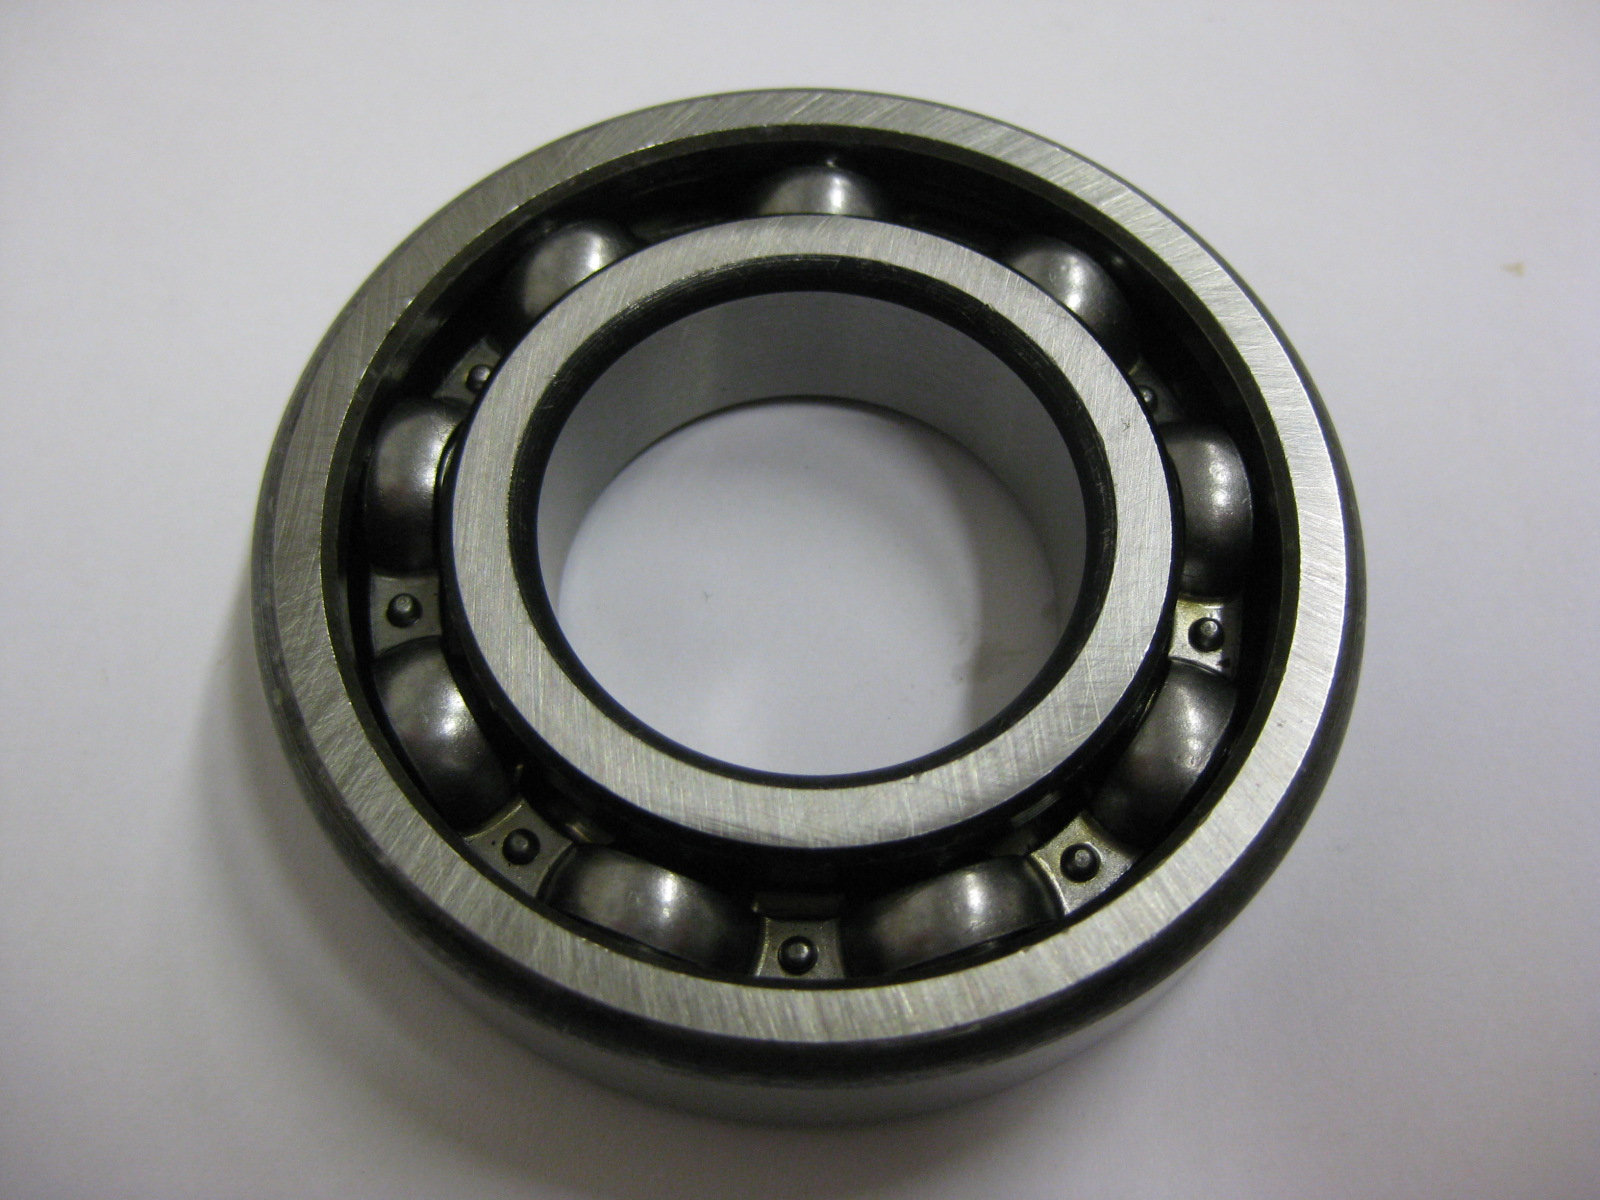 ložisko kuličkové 6207 V2-5 Multicar 25